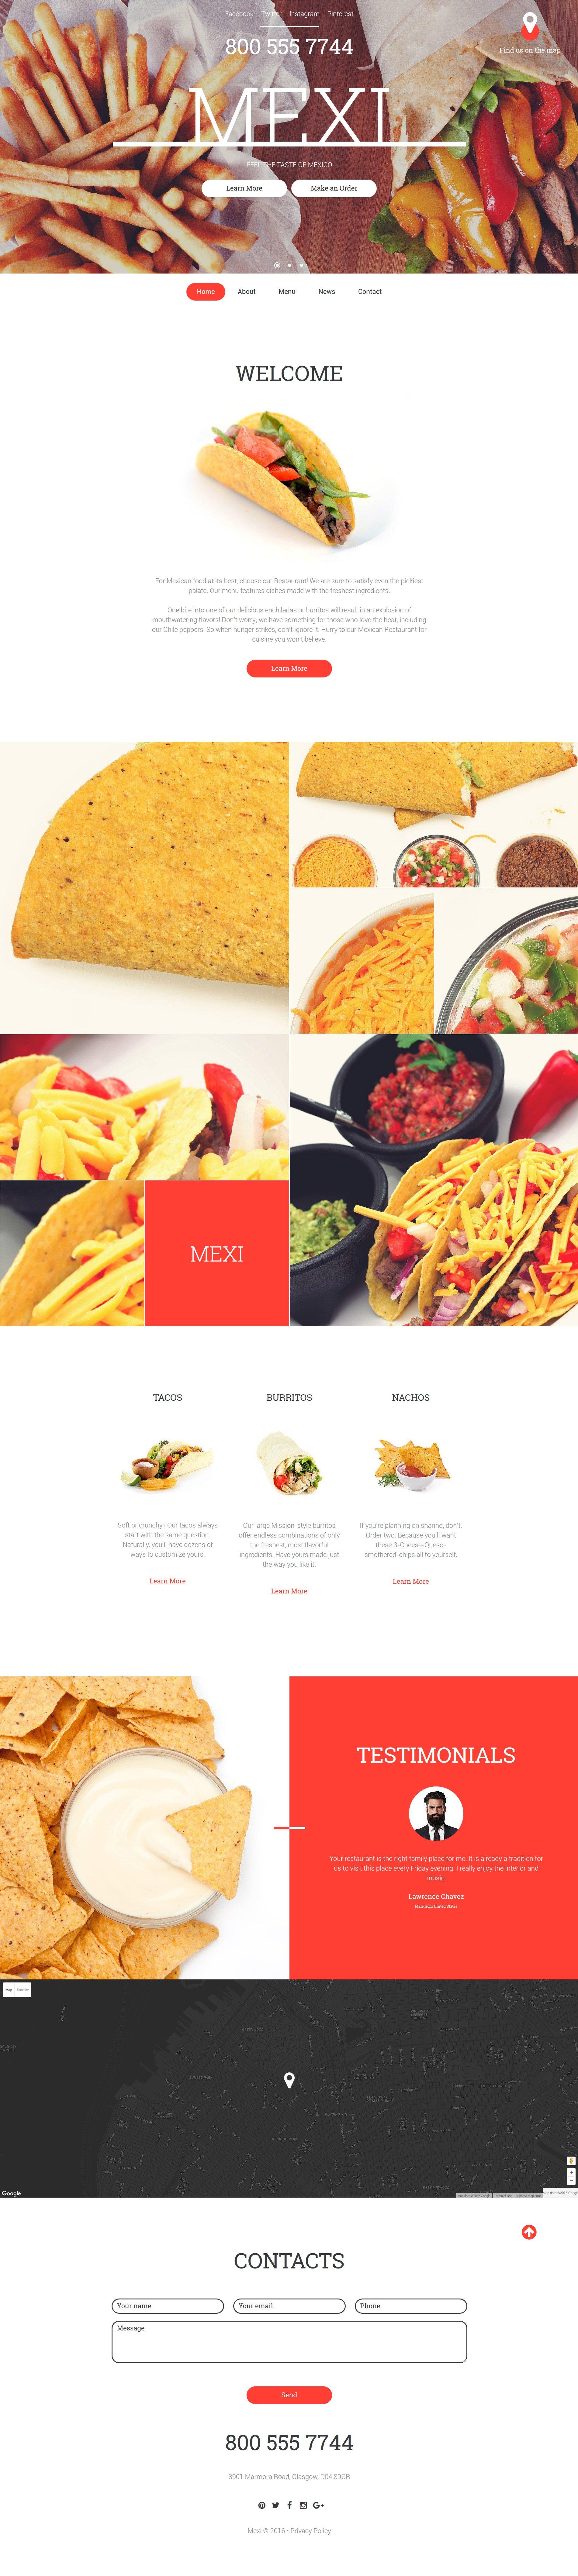 Mexican Restaurant Responsive Website Template